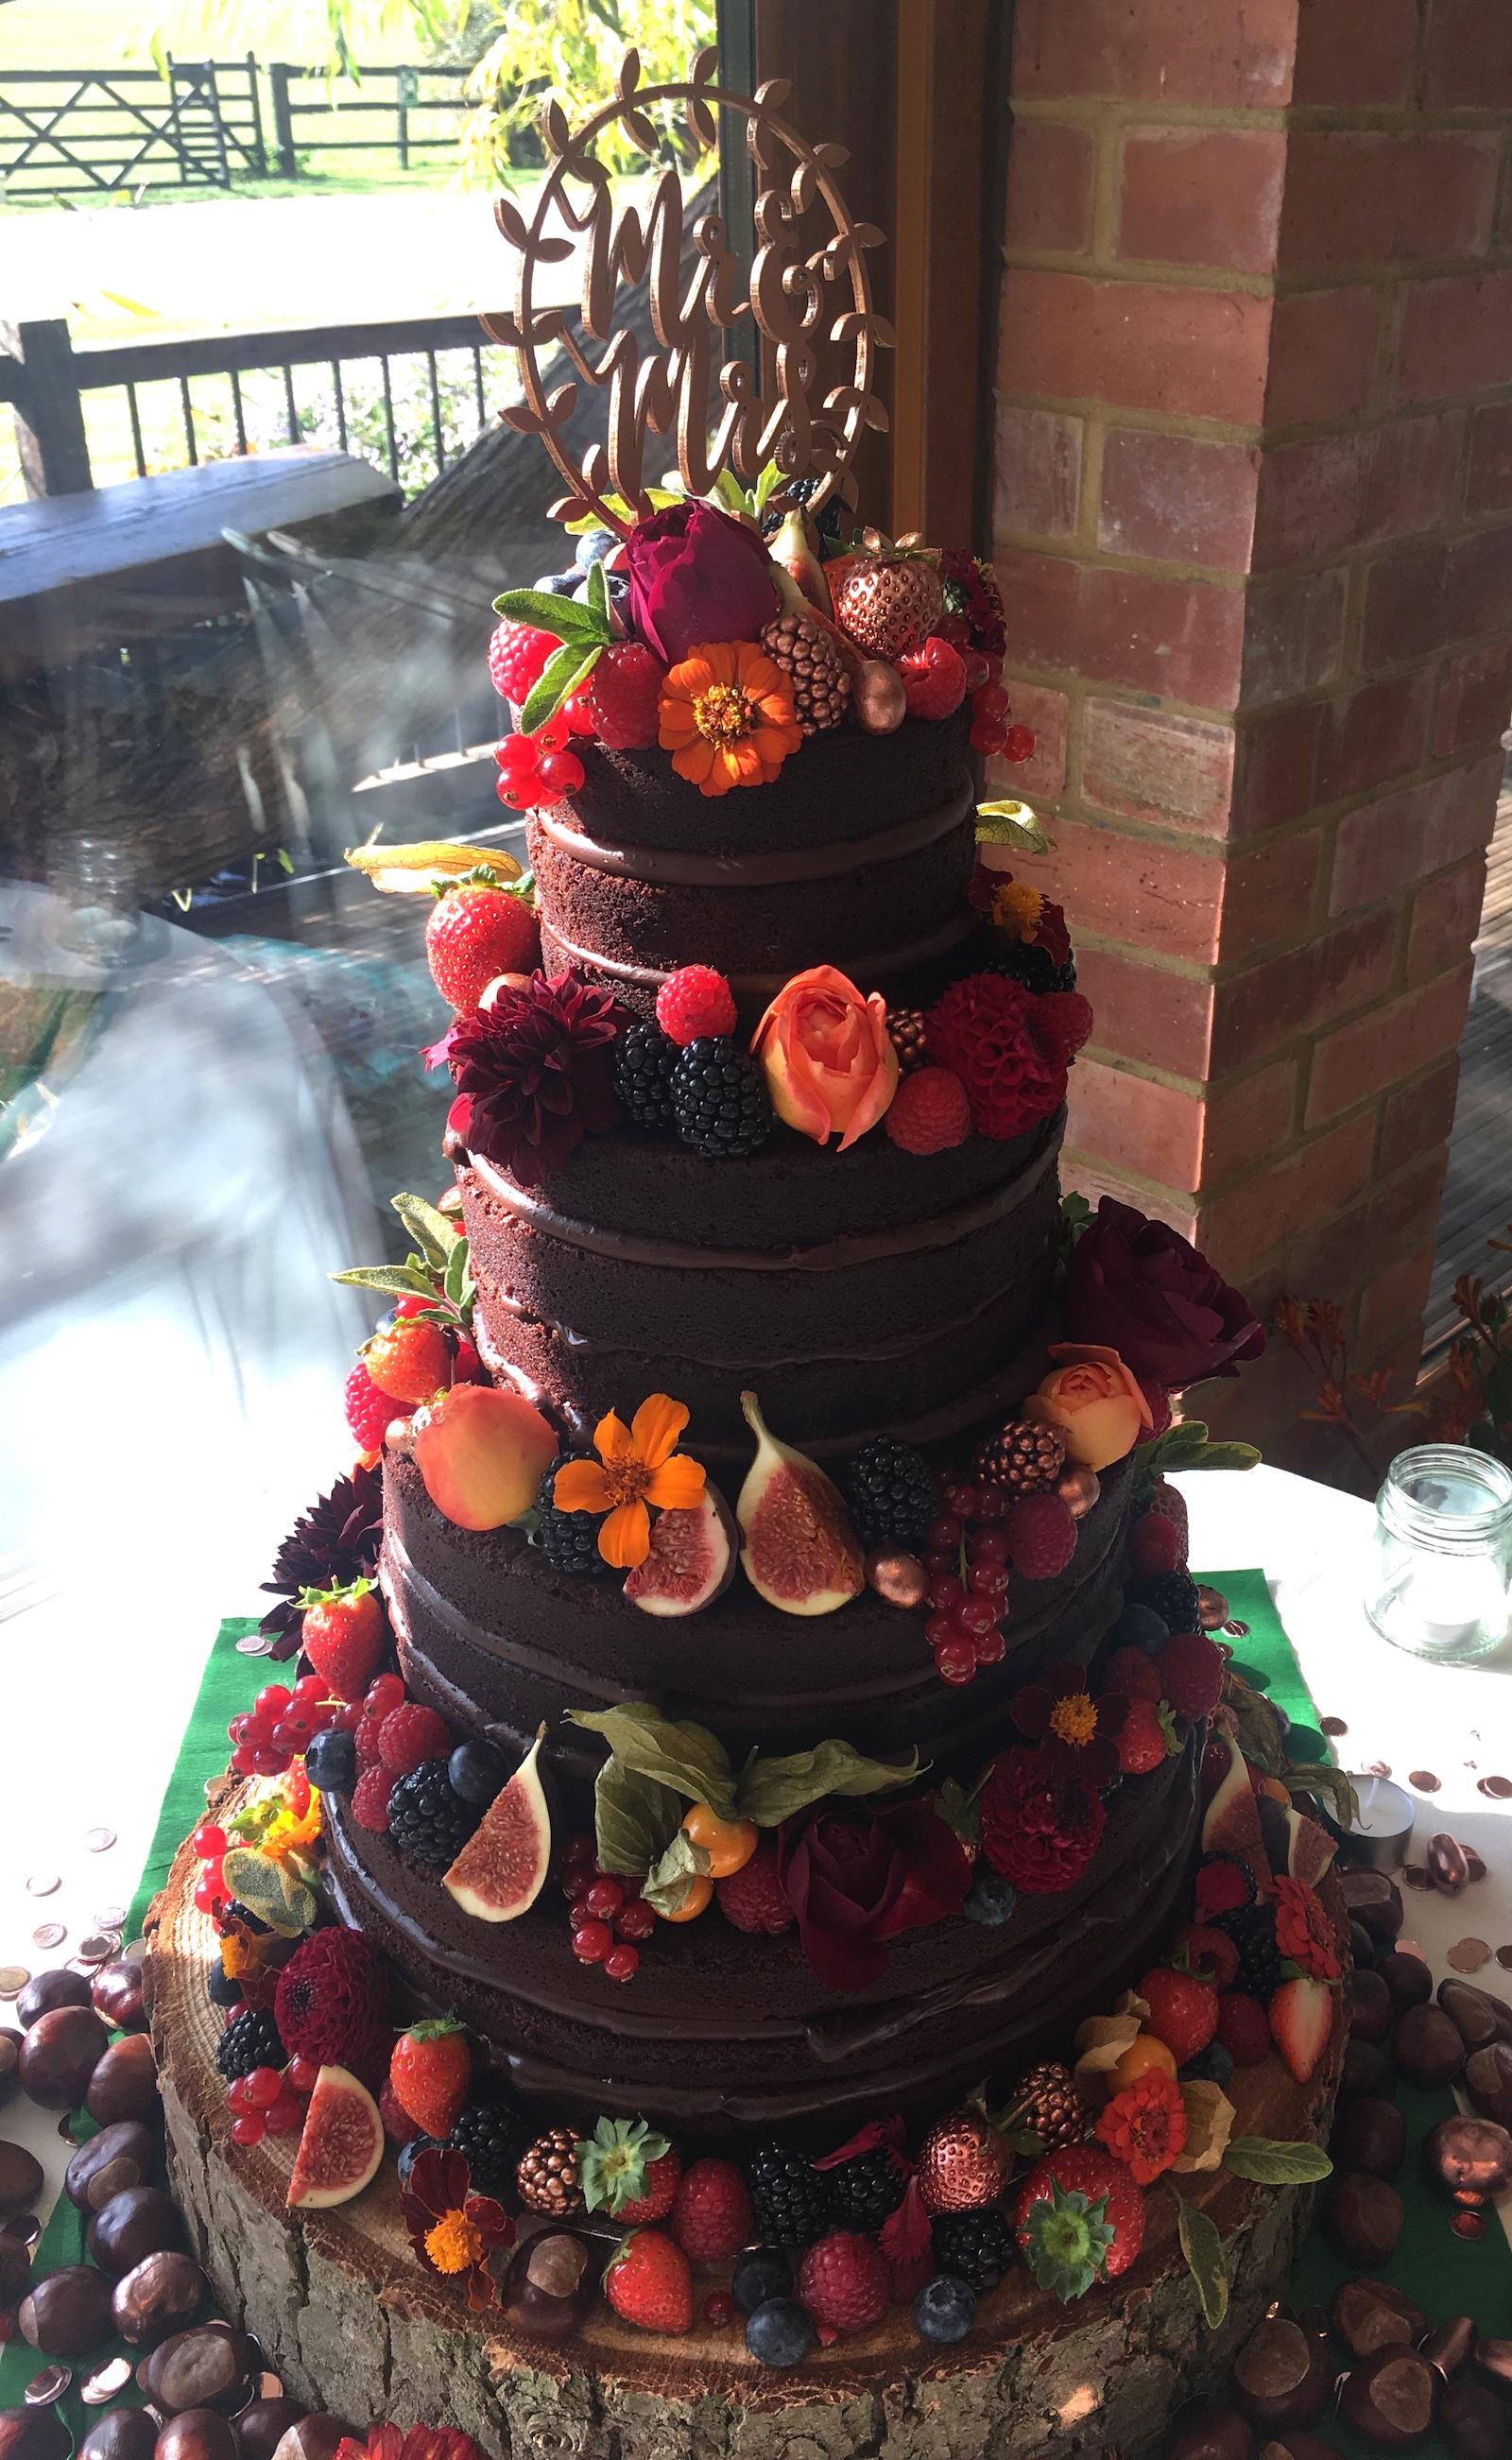 The Glorious Bakery_Cake07 1600x2603.jpg